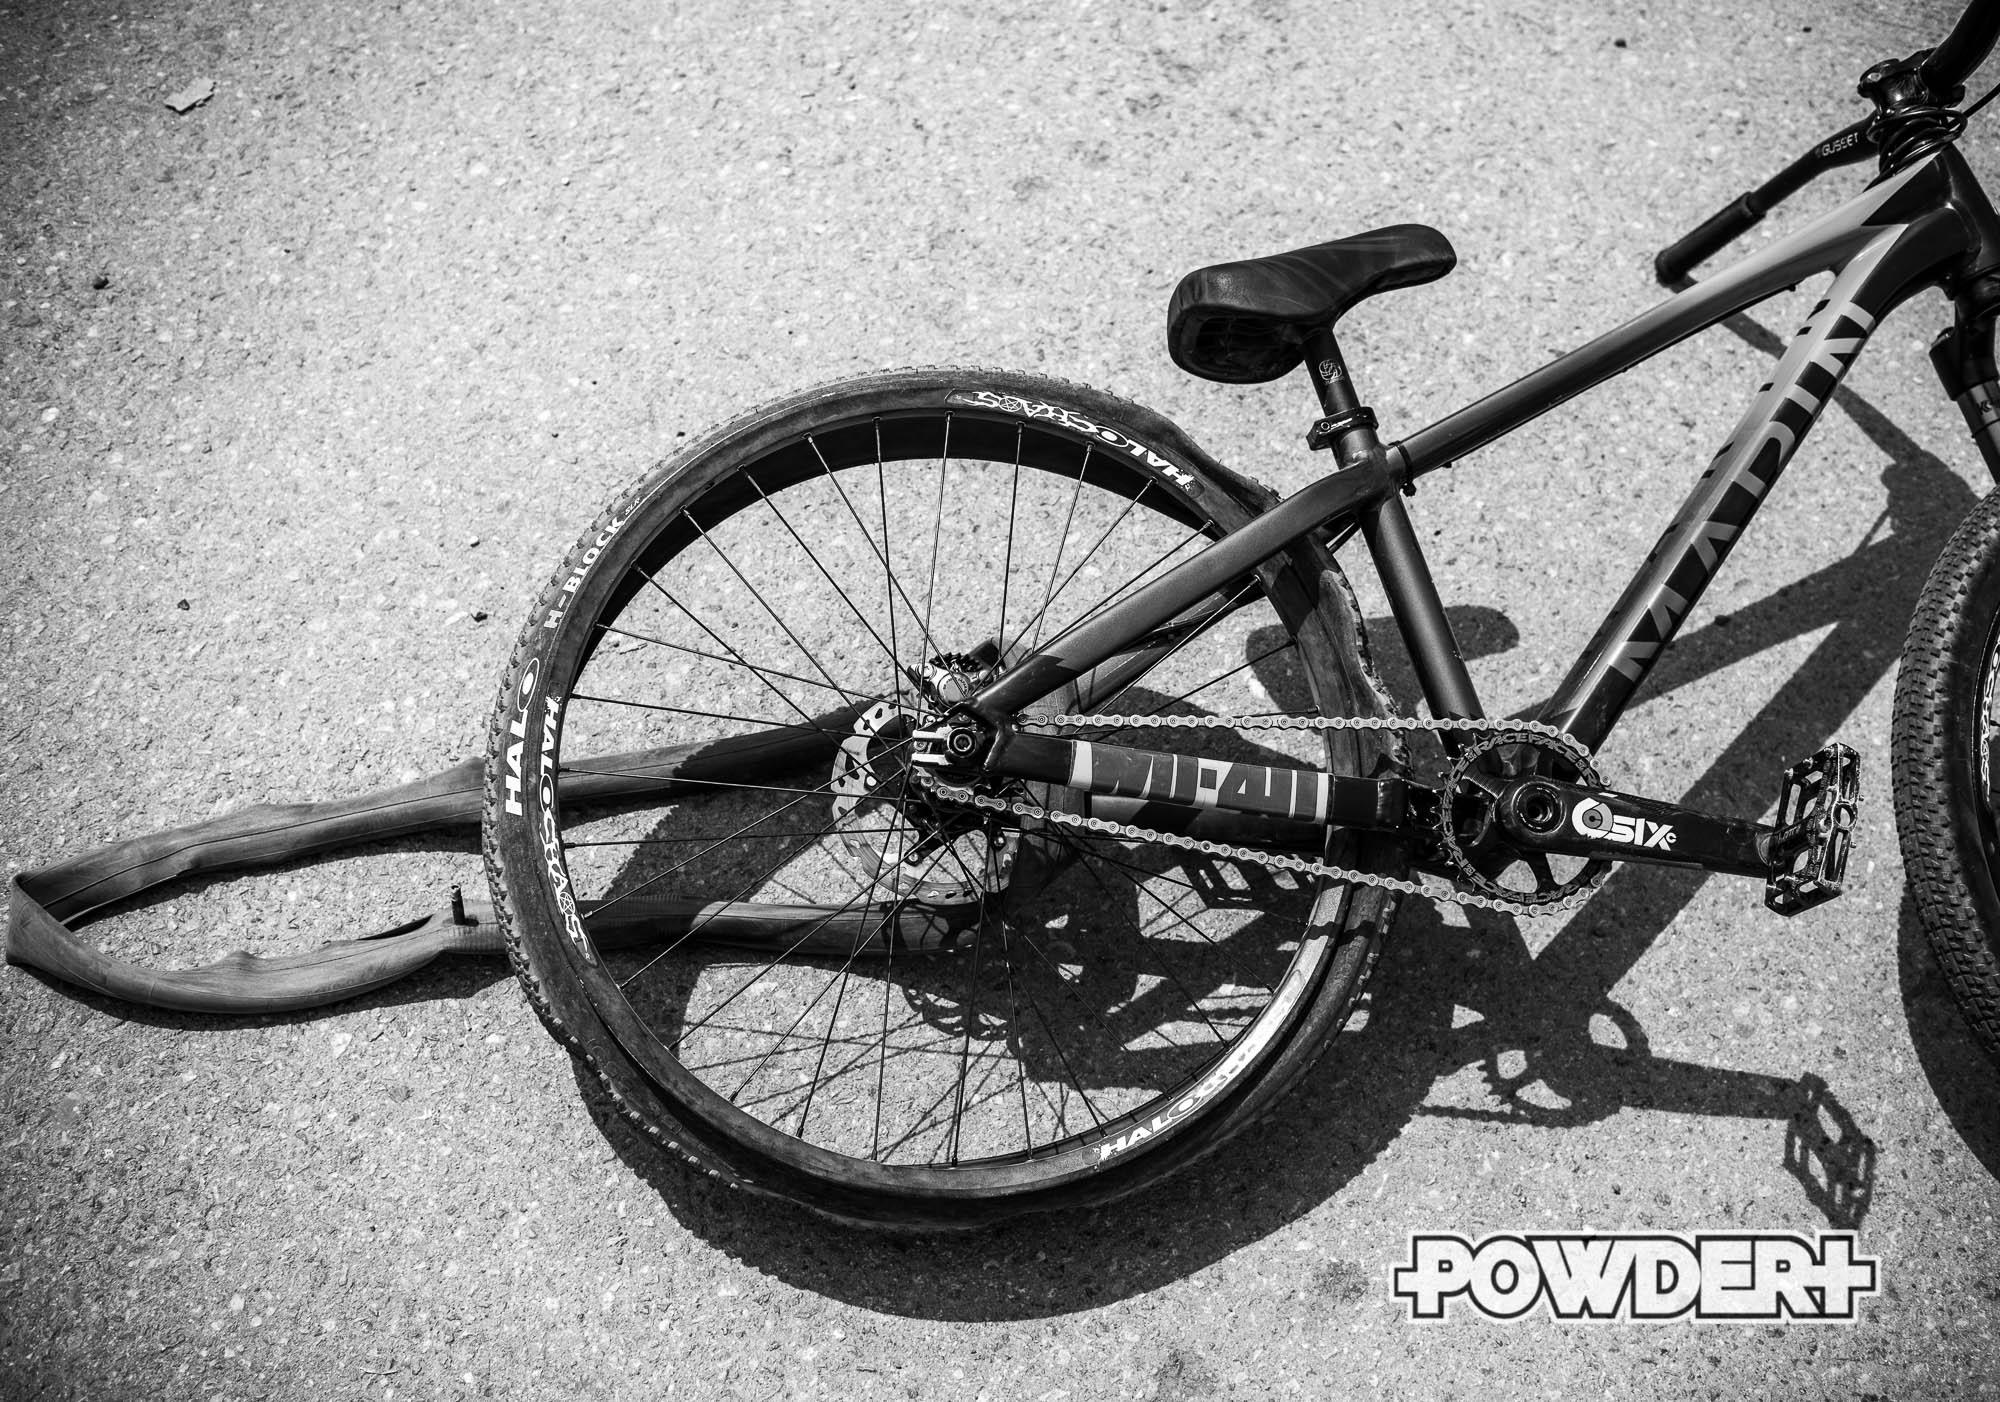 crankworx innsbruck, crankworx bericht, innsbruck bike, bikecity, Mountainbike, danny hart, josh bryceland